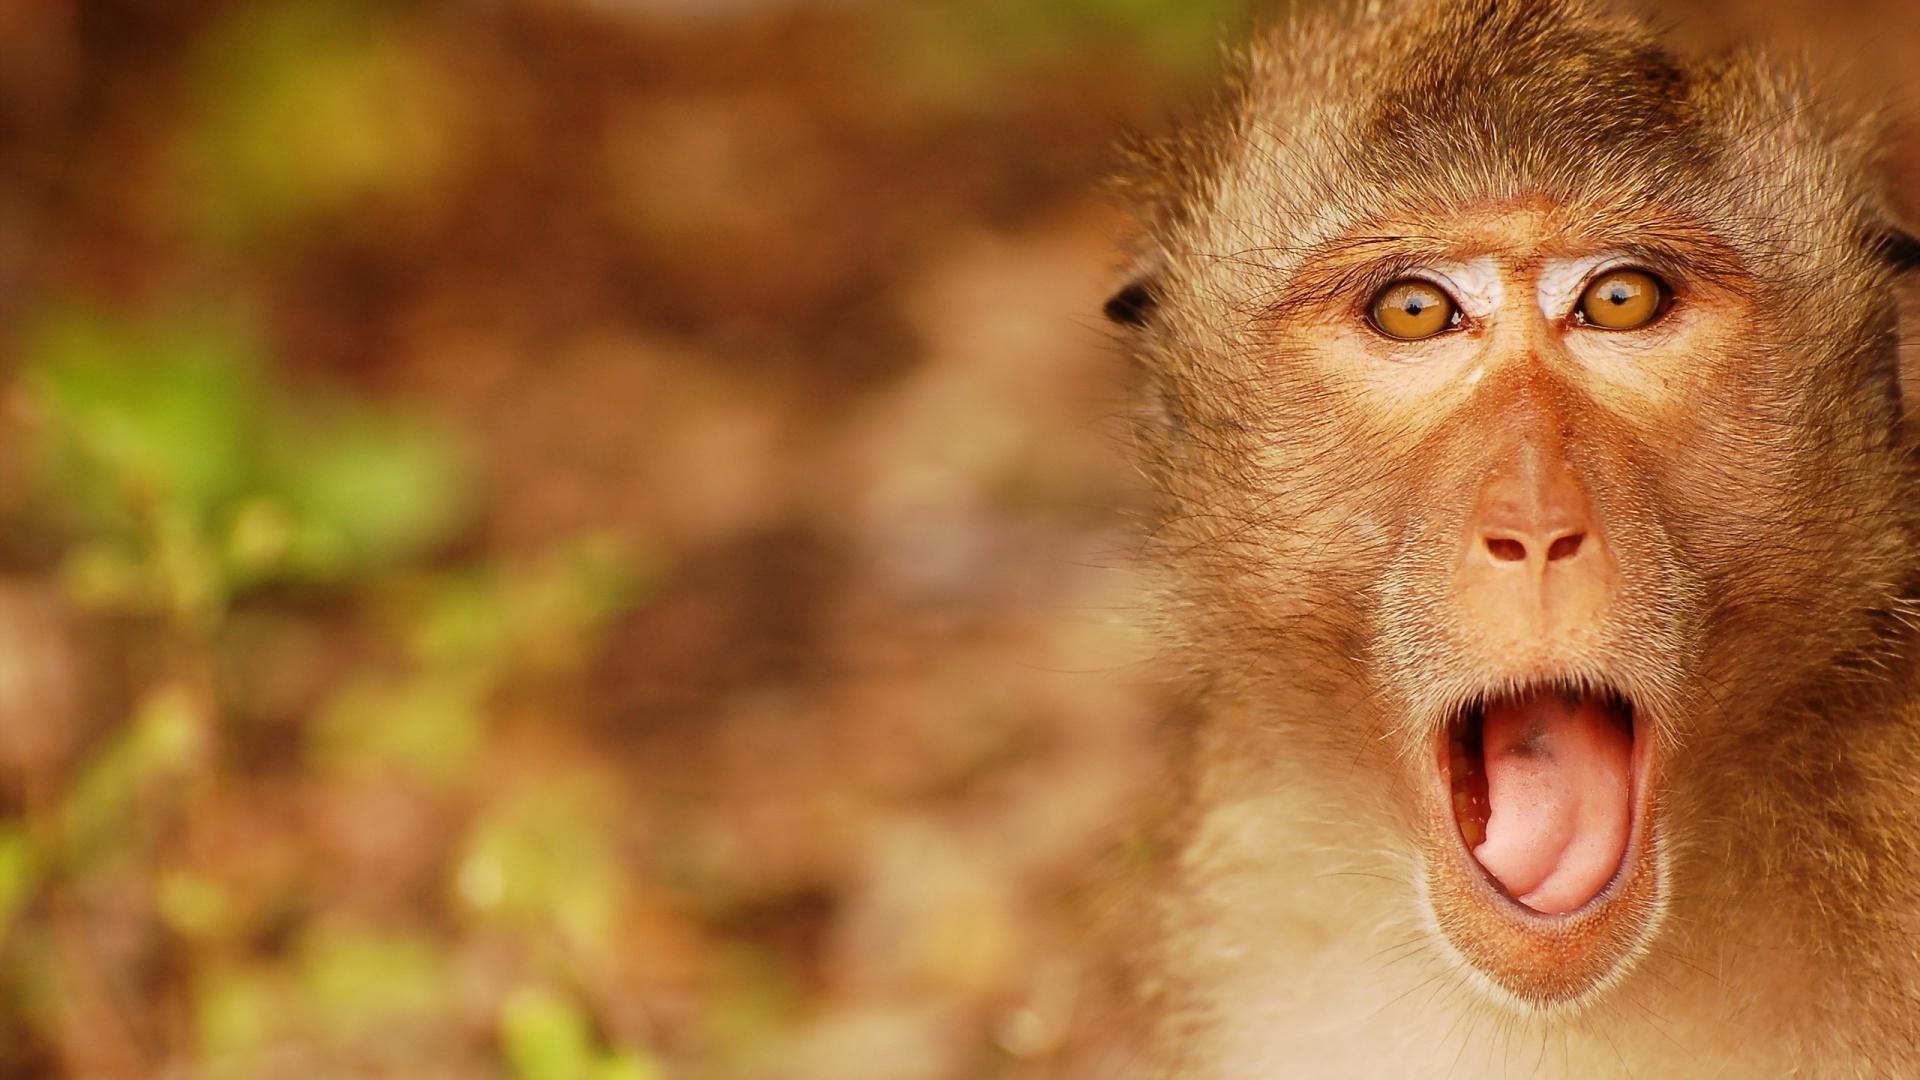 Baby Monkey Wallpaper 1920×1080